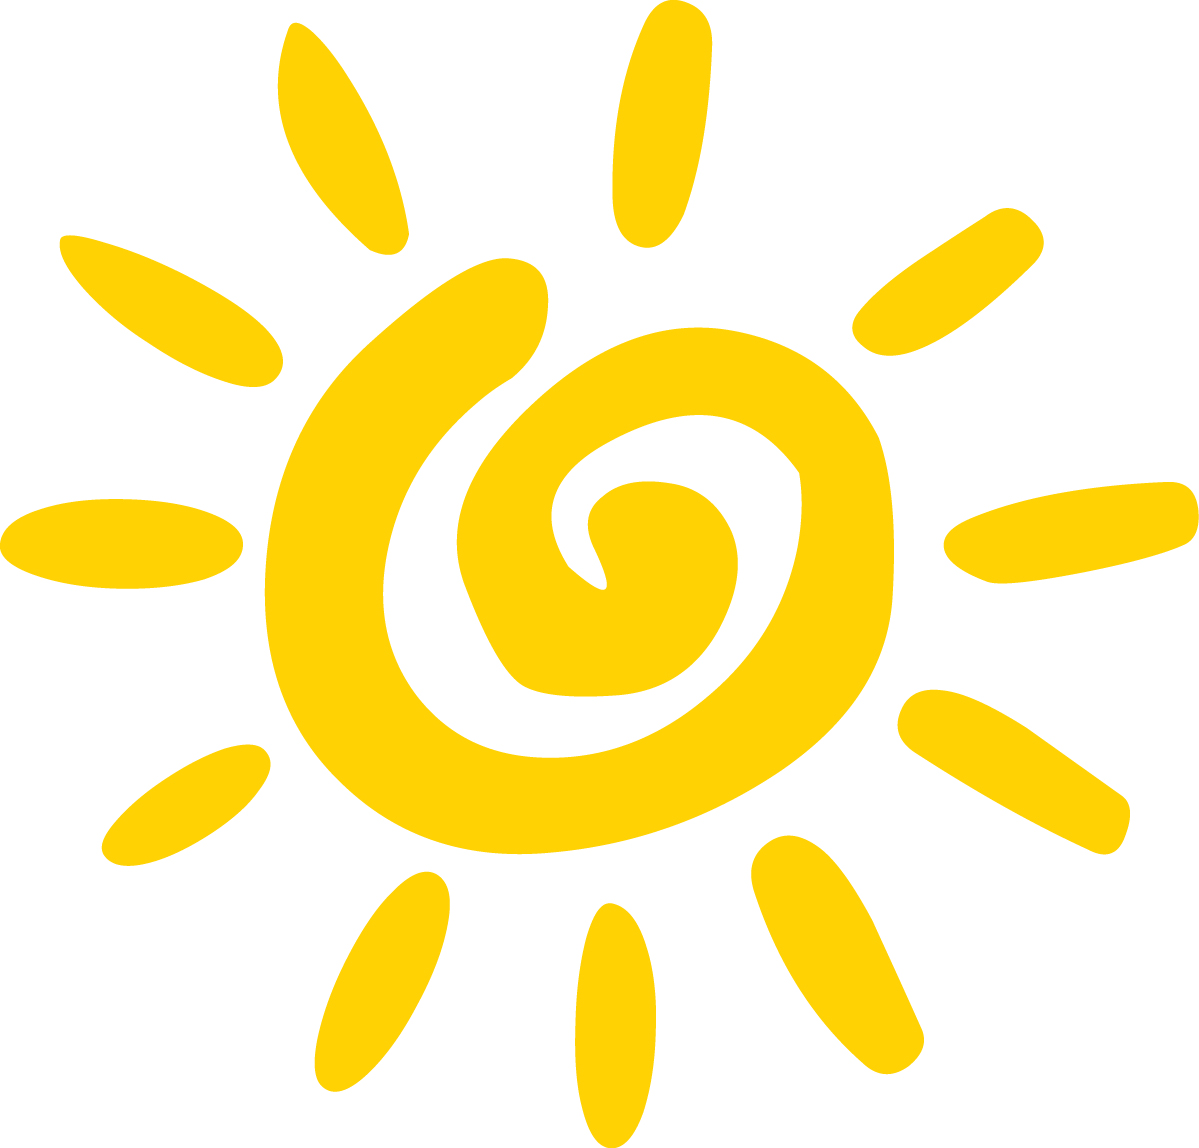 Sun Clipart Free Images At Clker Com Vec-Sun Clipart Free Images At Clker Com Vector Clip Art Online-10